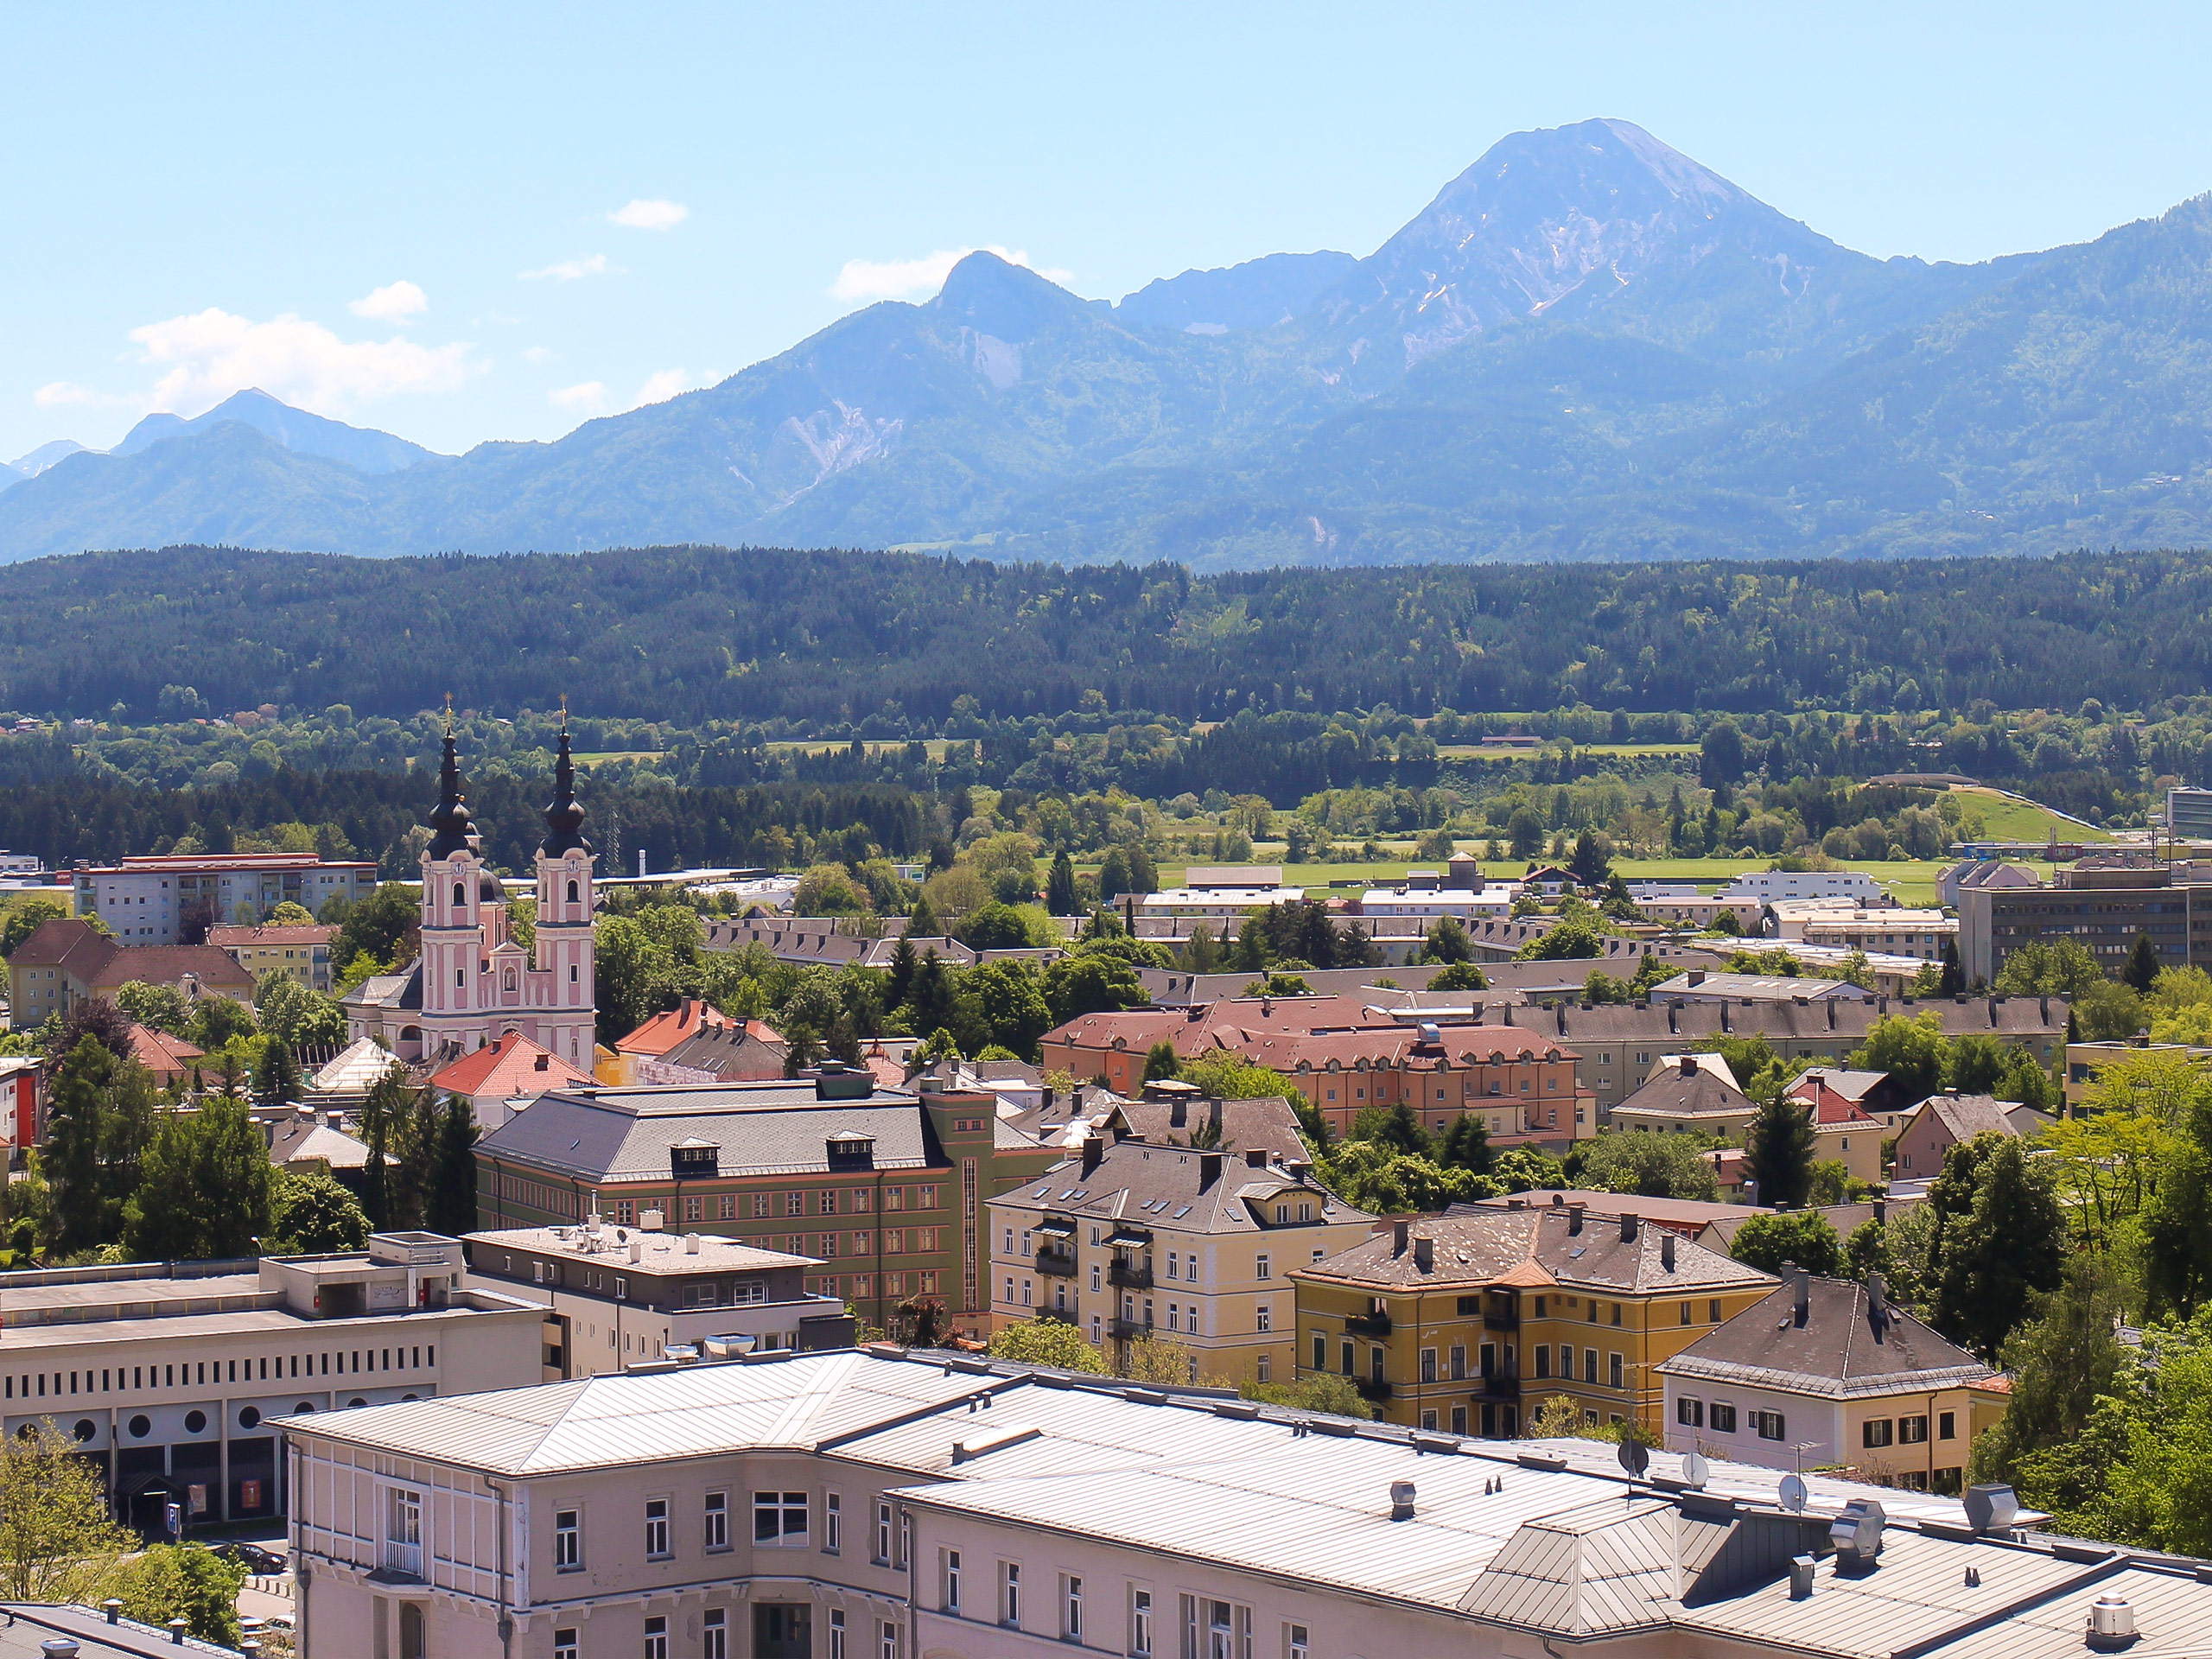 Villach Cityscape and Mountains